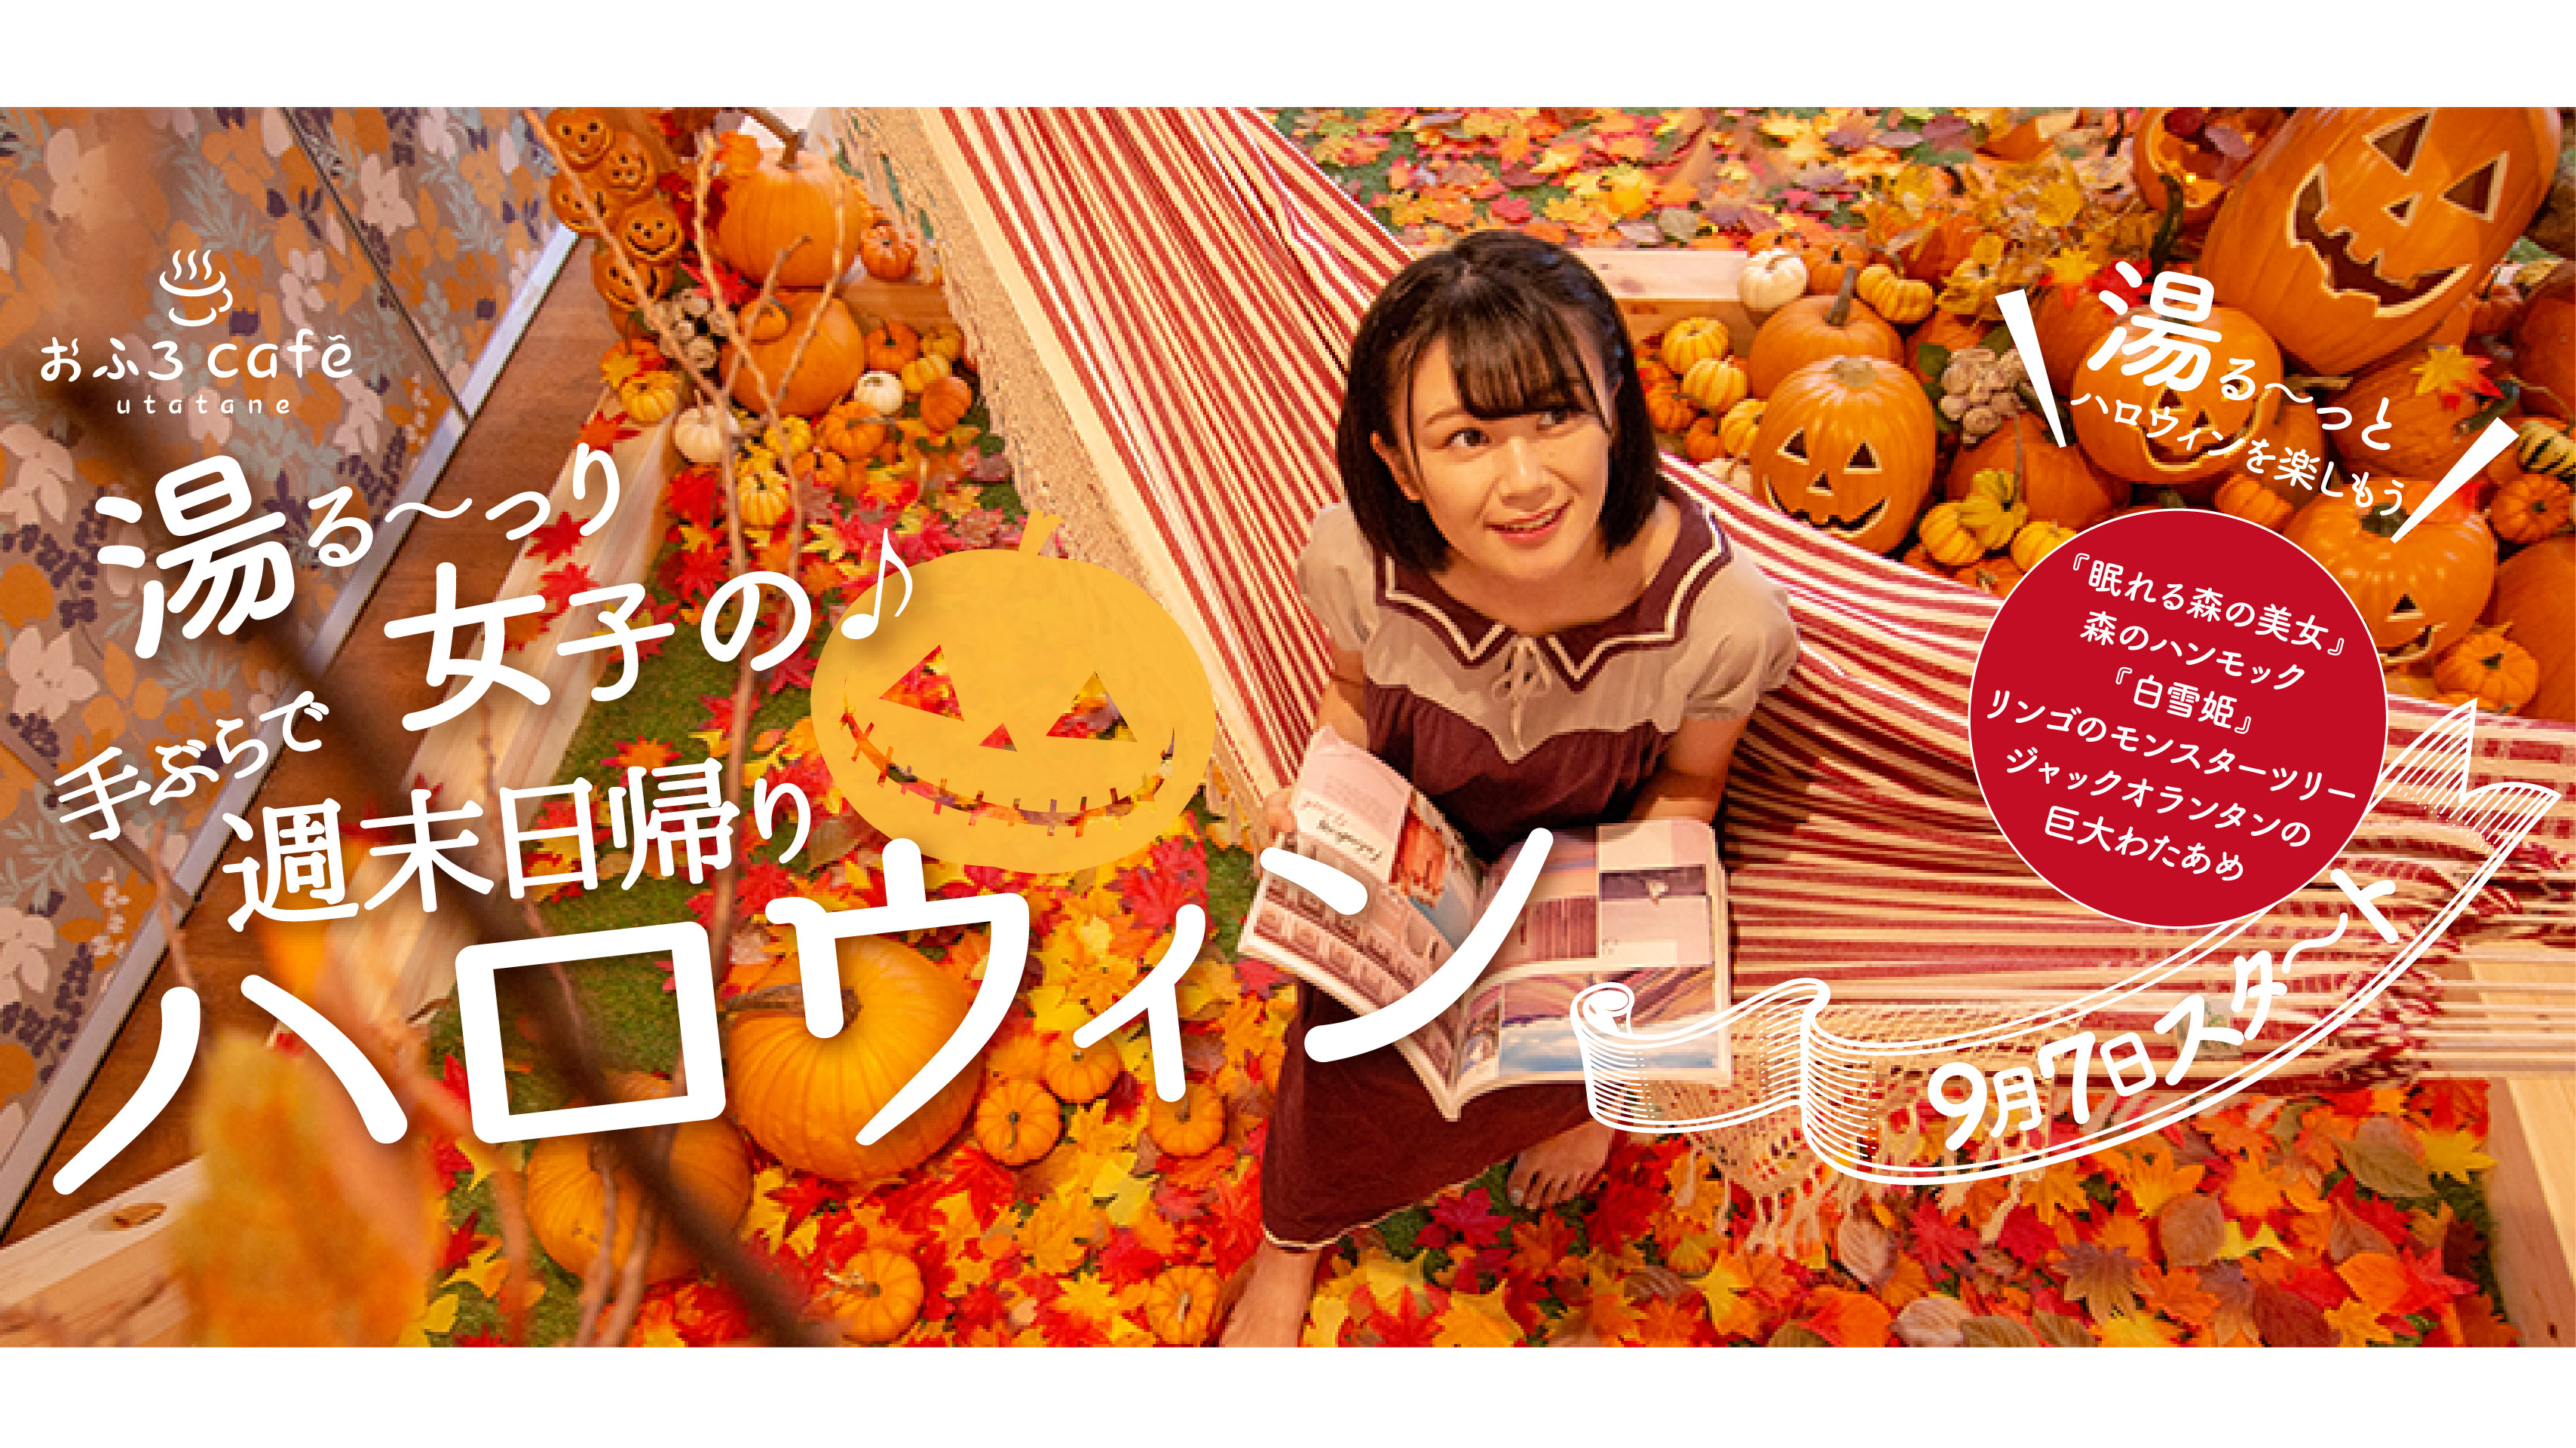 1809_FB_utatane_Halloween-01